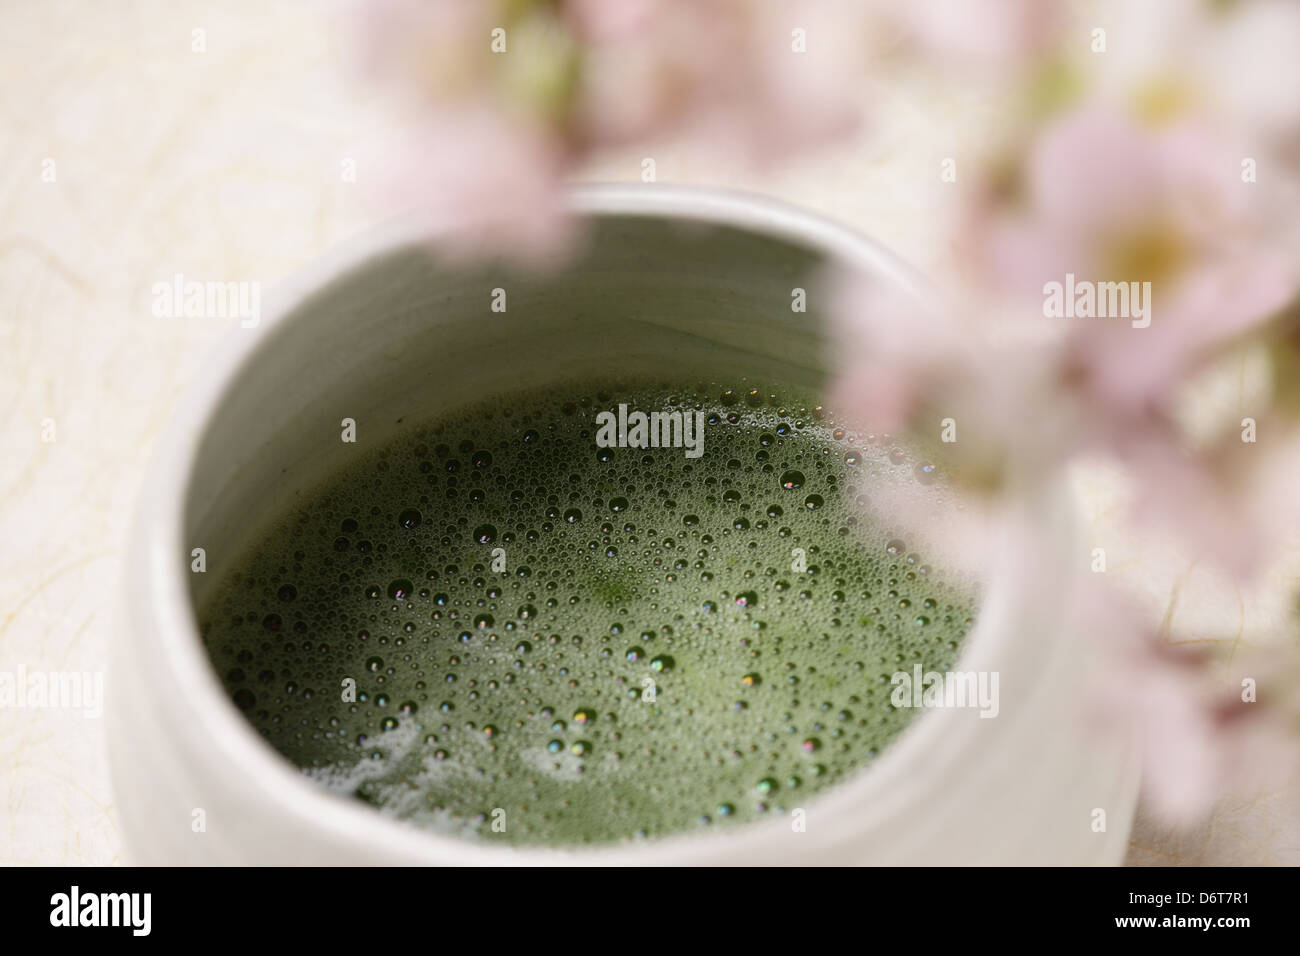 Matcha green tea - Stock Image